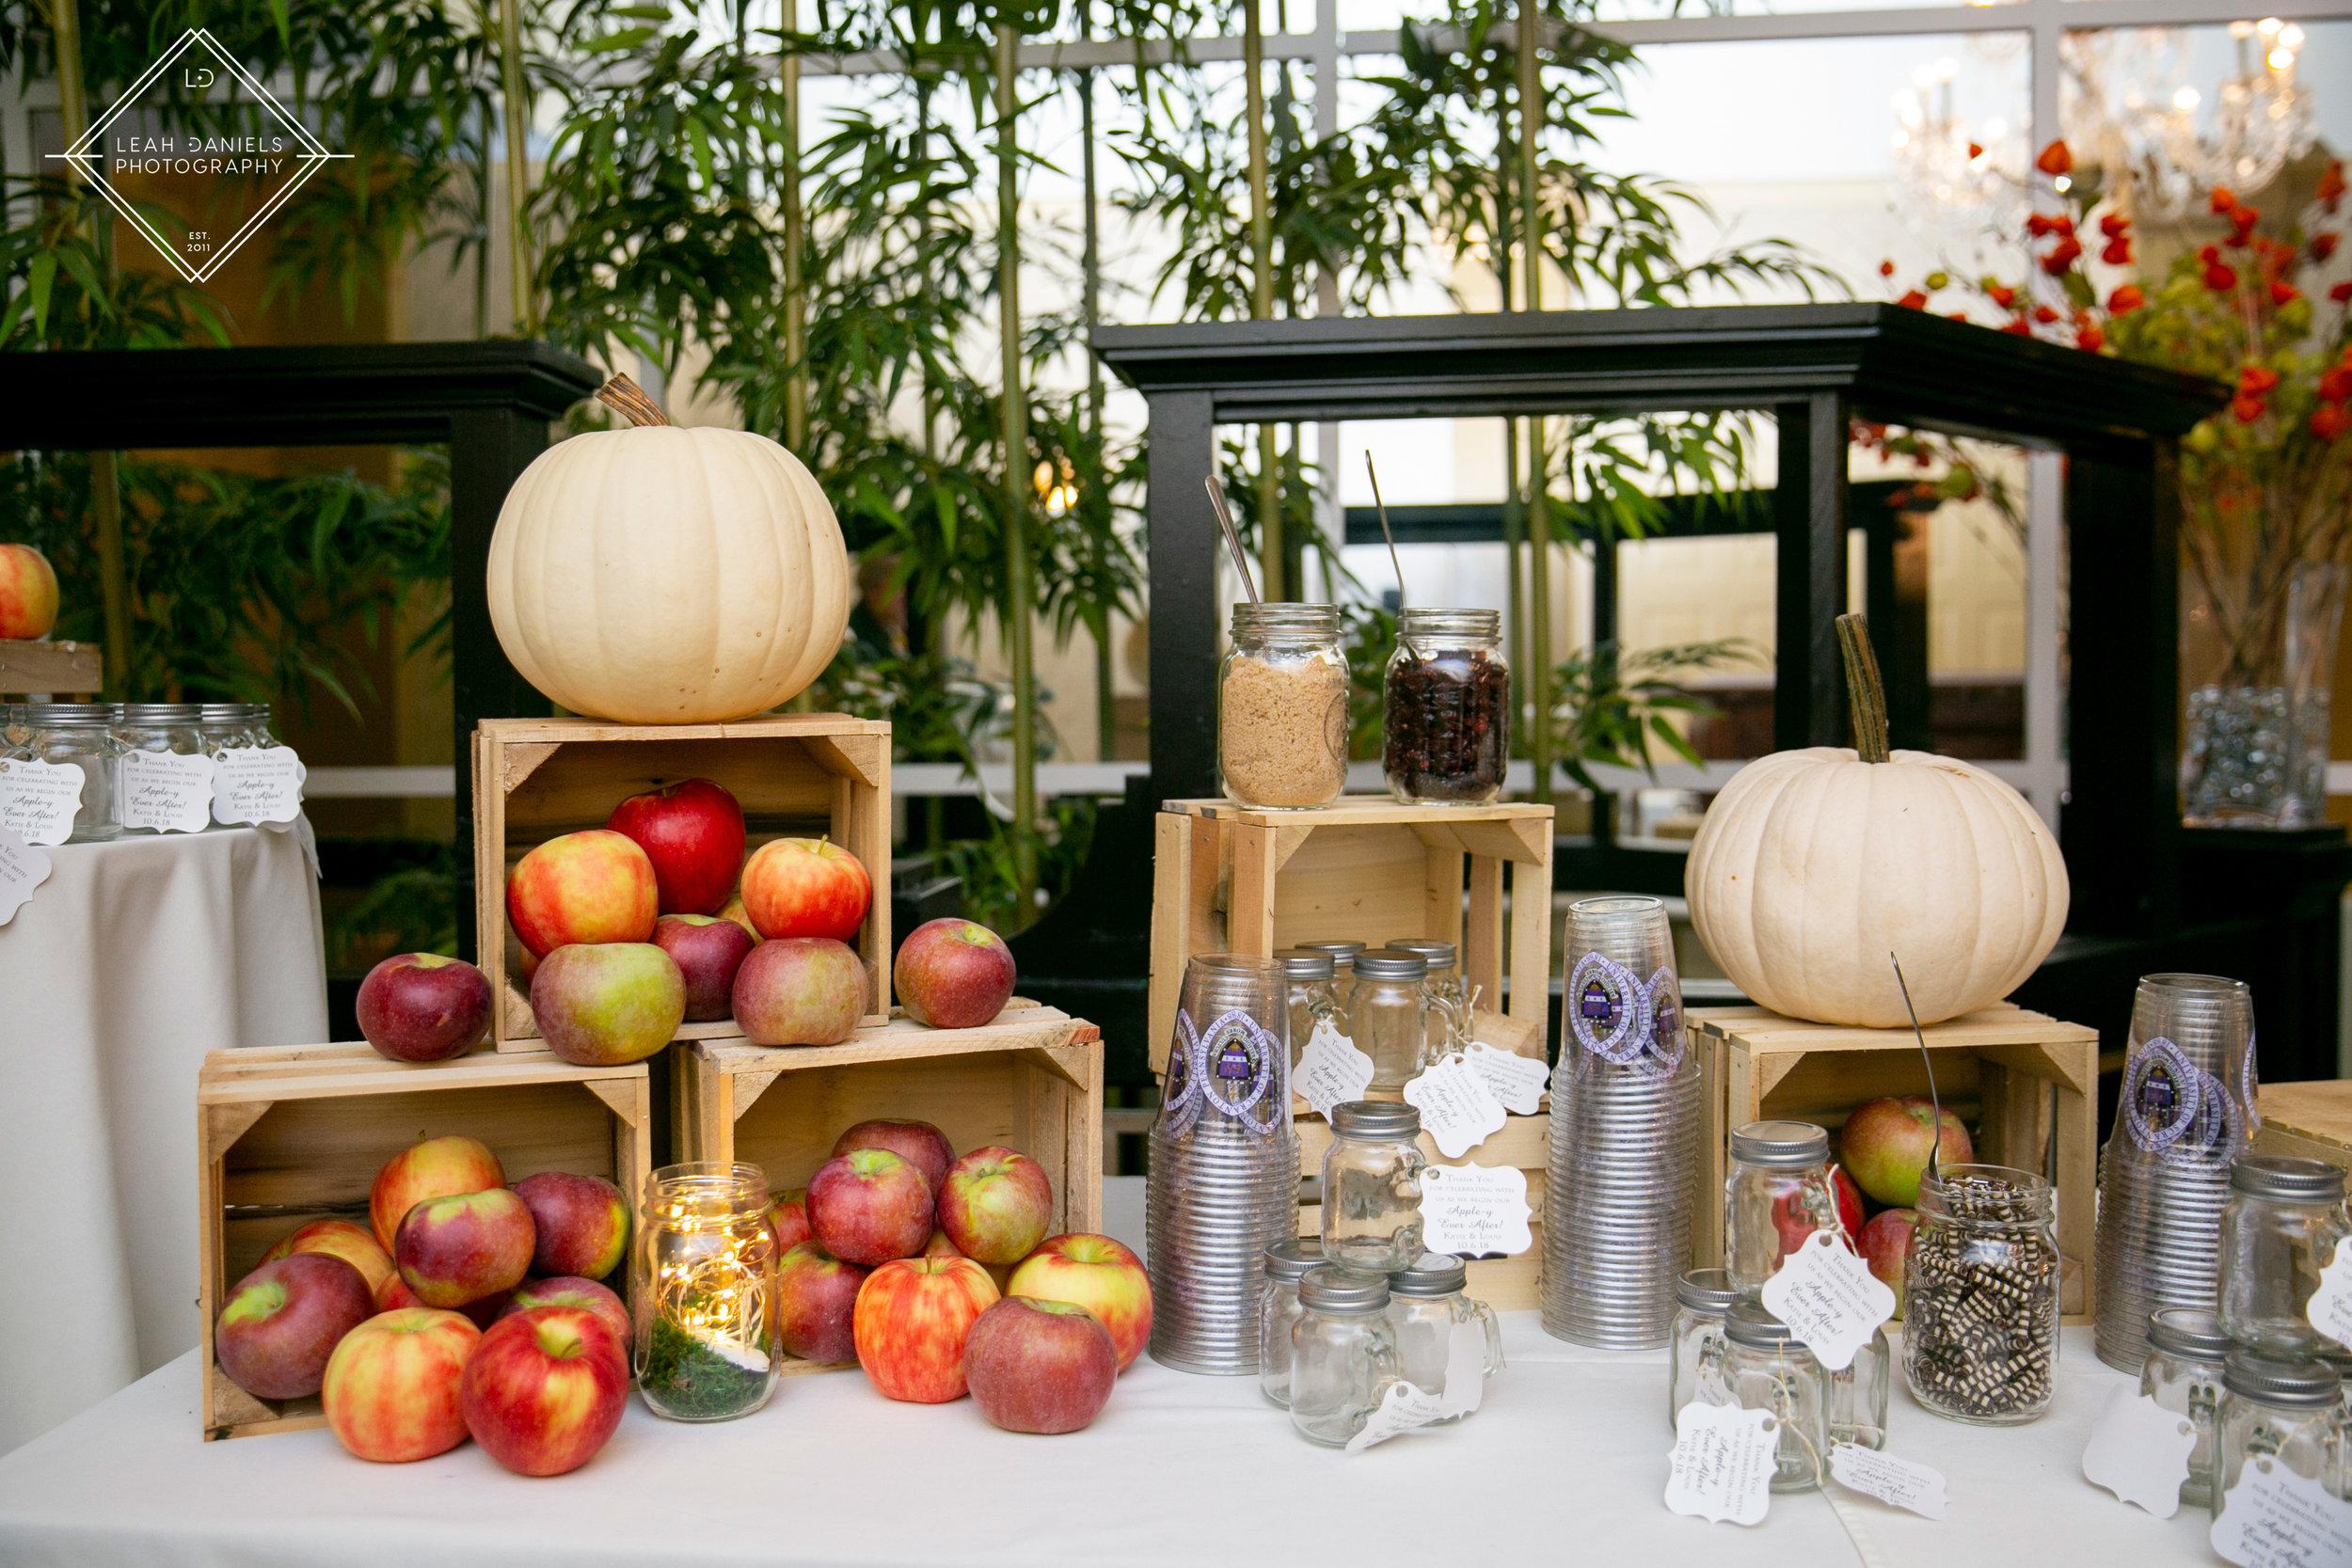 Radisson Scranton Wedding - Apple cider and Donut Bar